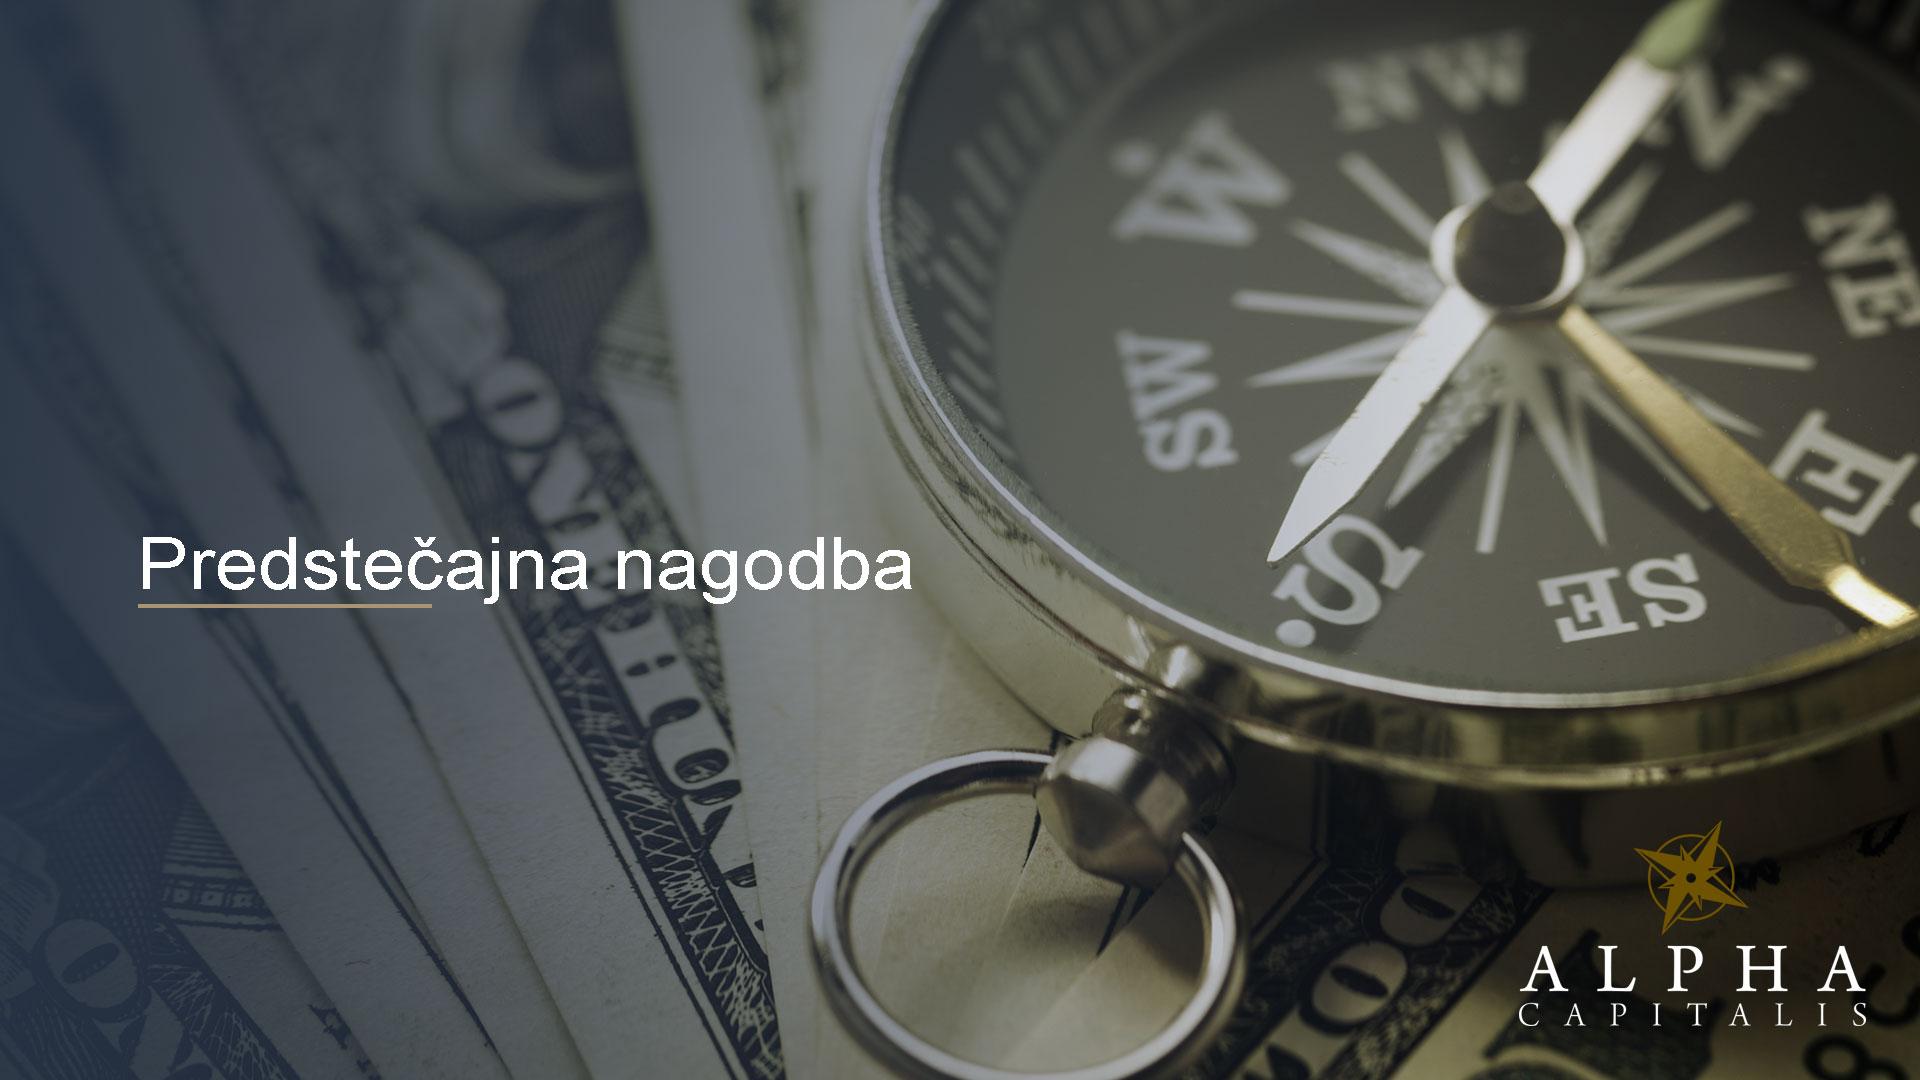 Alpha-capitalis-Blog-predstečajna-nagodba